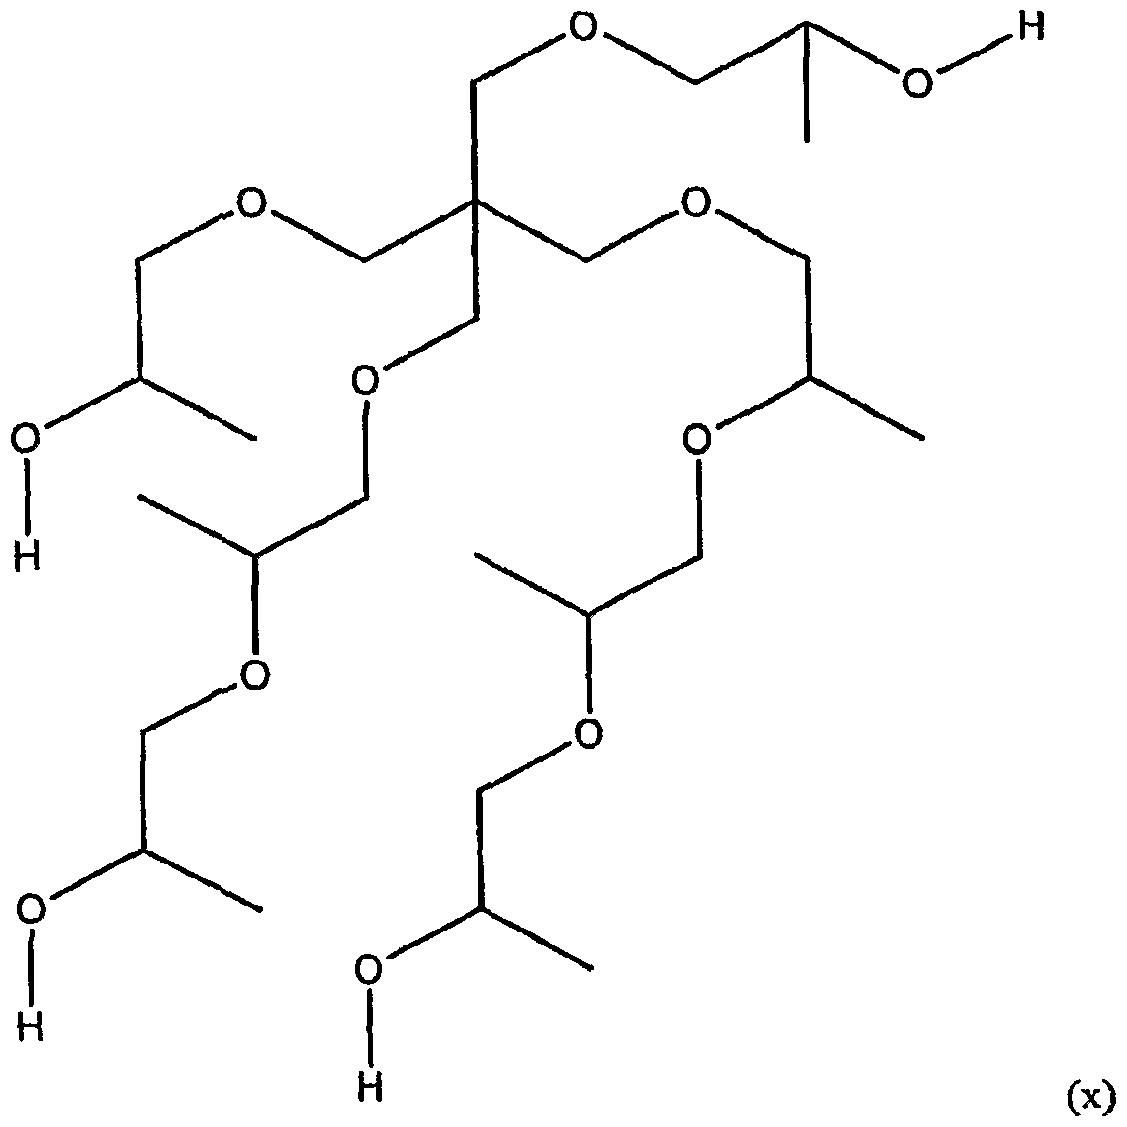 patent ep2062094a1